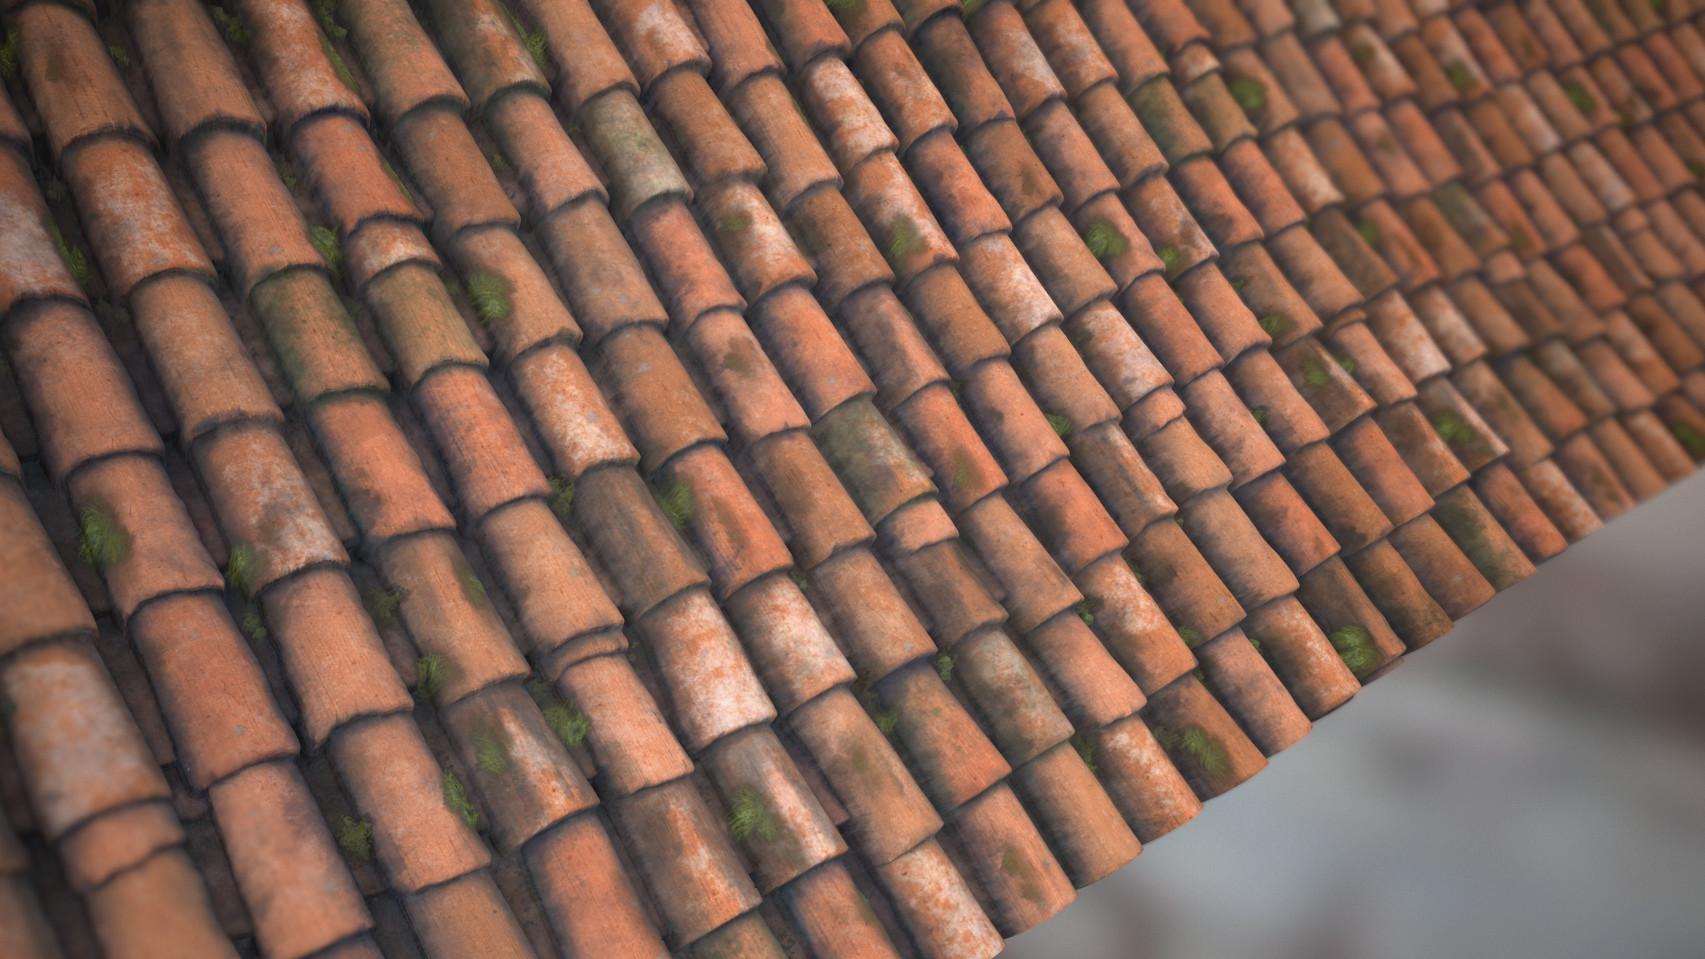 Alina godfrey roof tiles